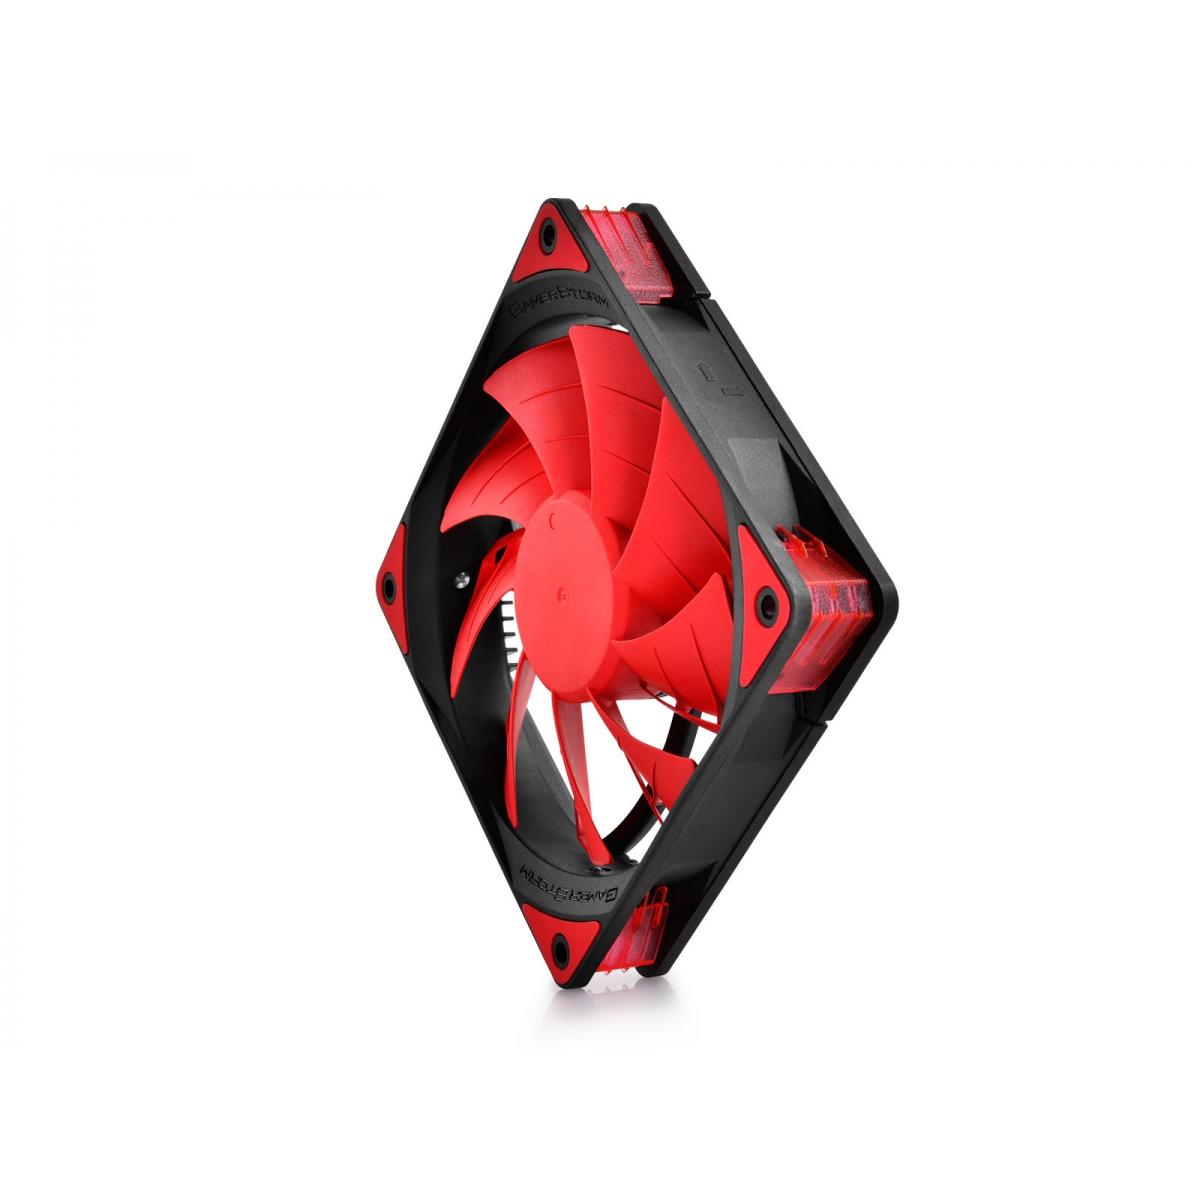 Cooler para Gabinete Gamer Storm Deepcool, LED Red 120mm, DPGS-FTF-TF120RR